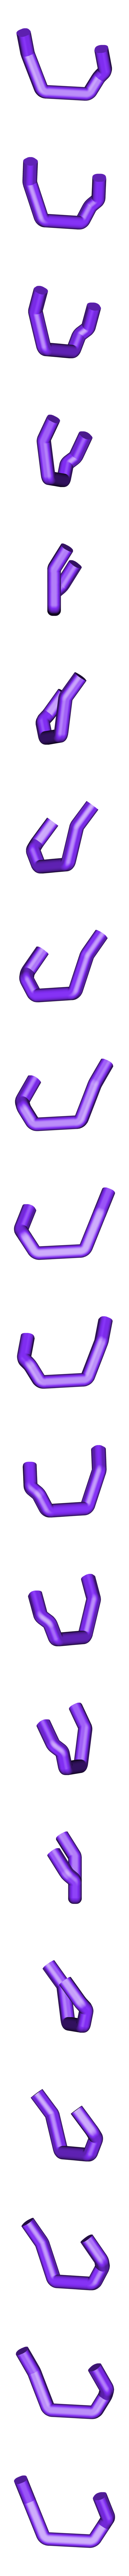 pipe-2.stl Download free STL file Pod Walker • 3D printing object, ferjerez3d